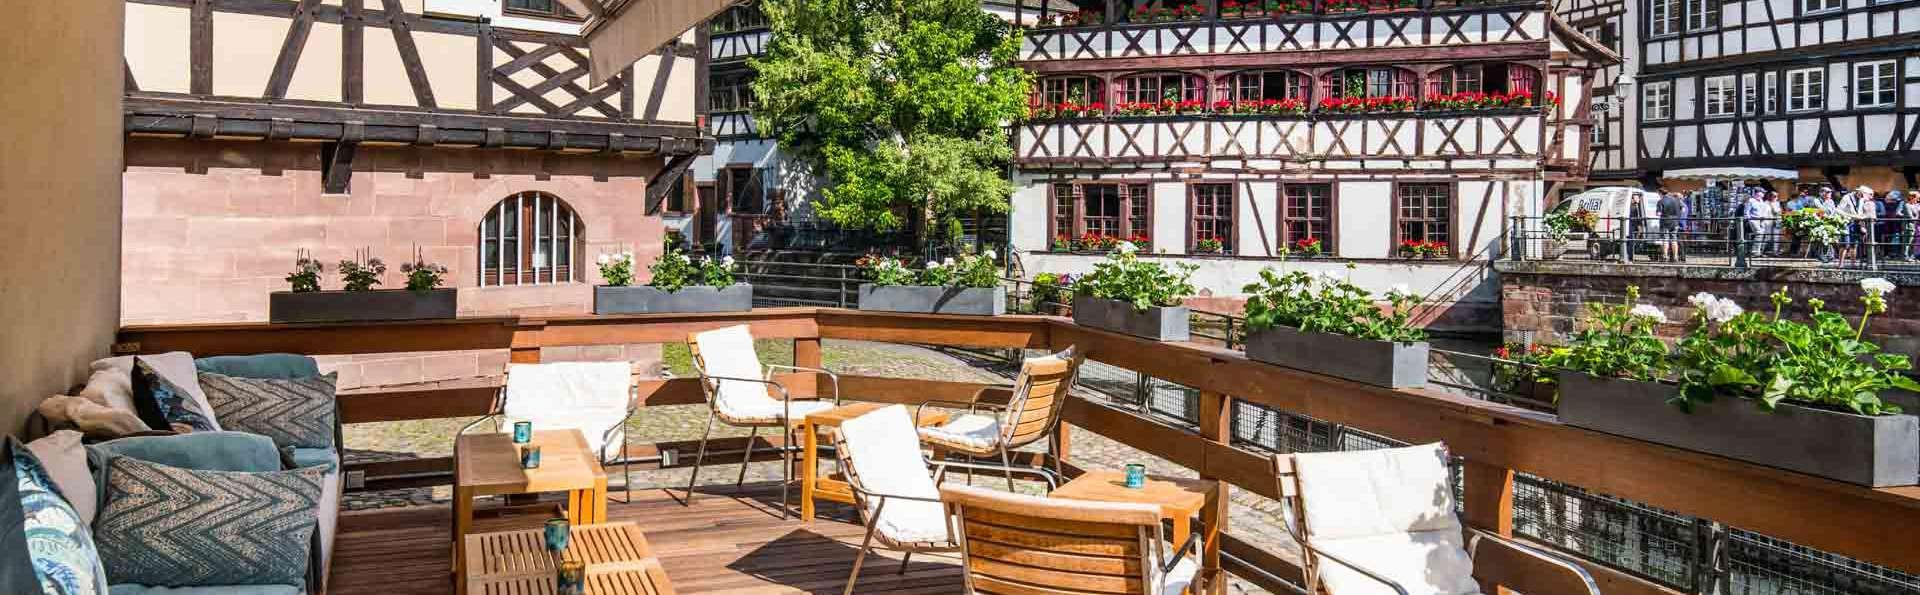 Week-end bien-être dans un prestigieux hôtel strasbourgeois